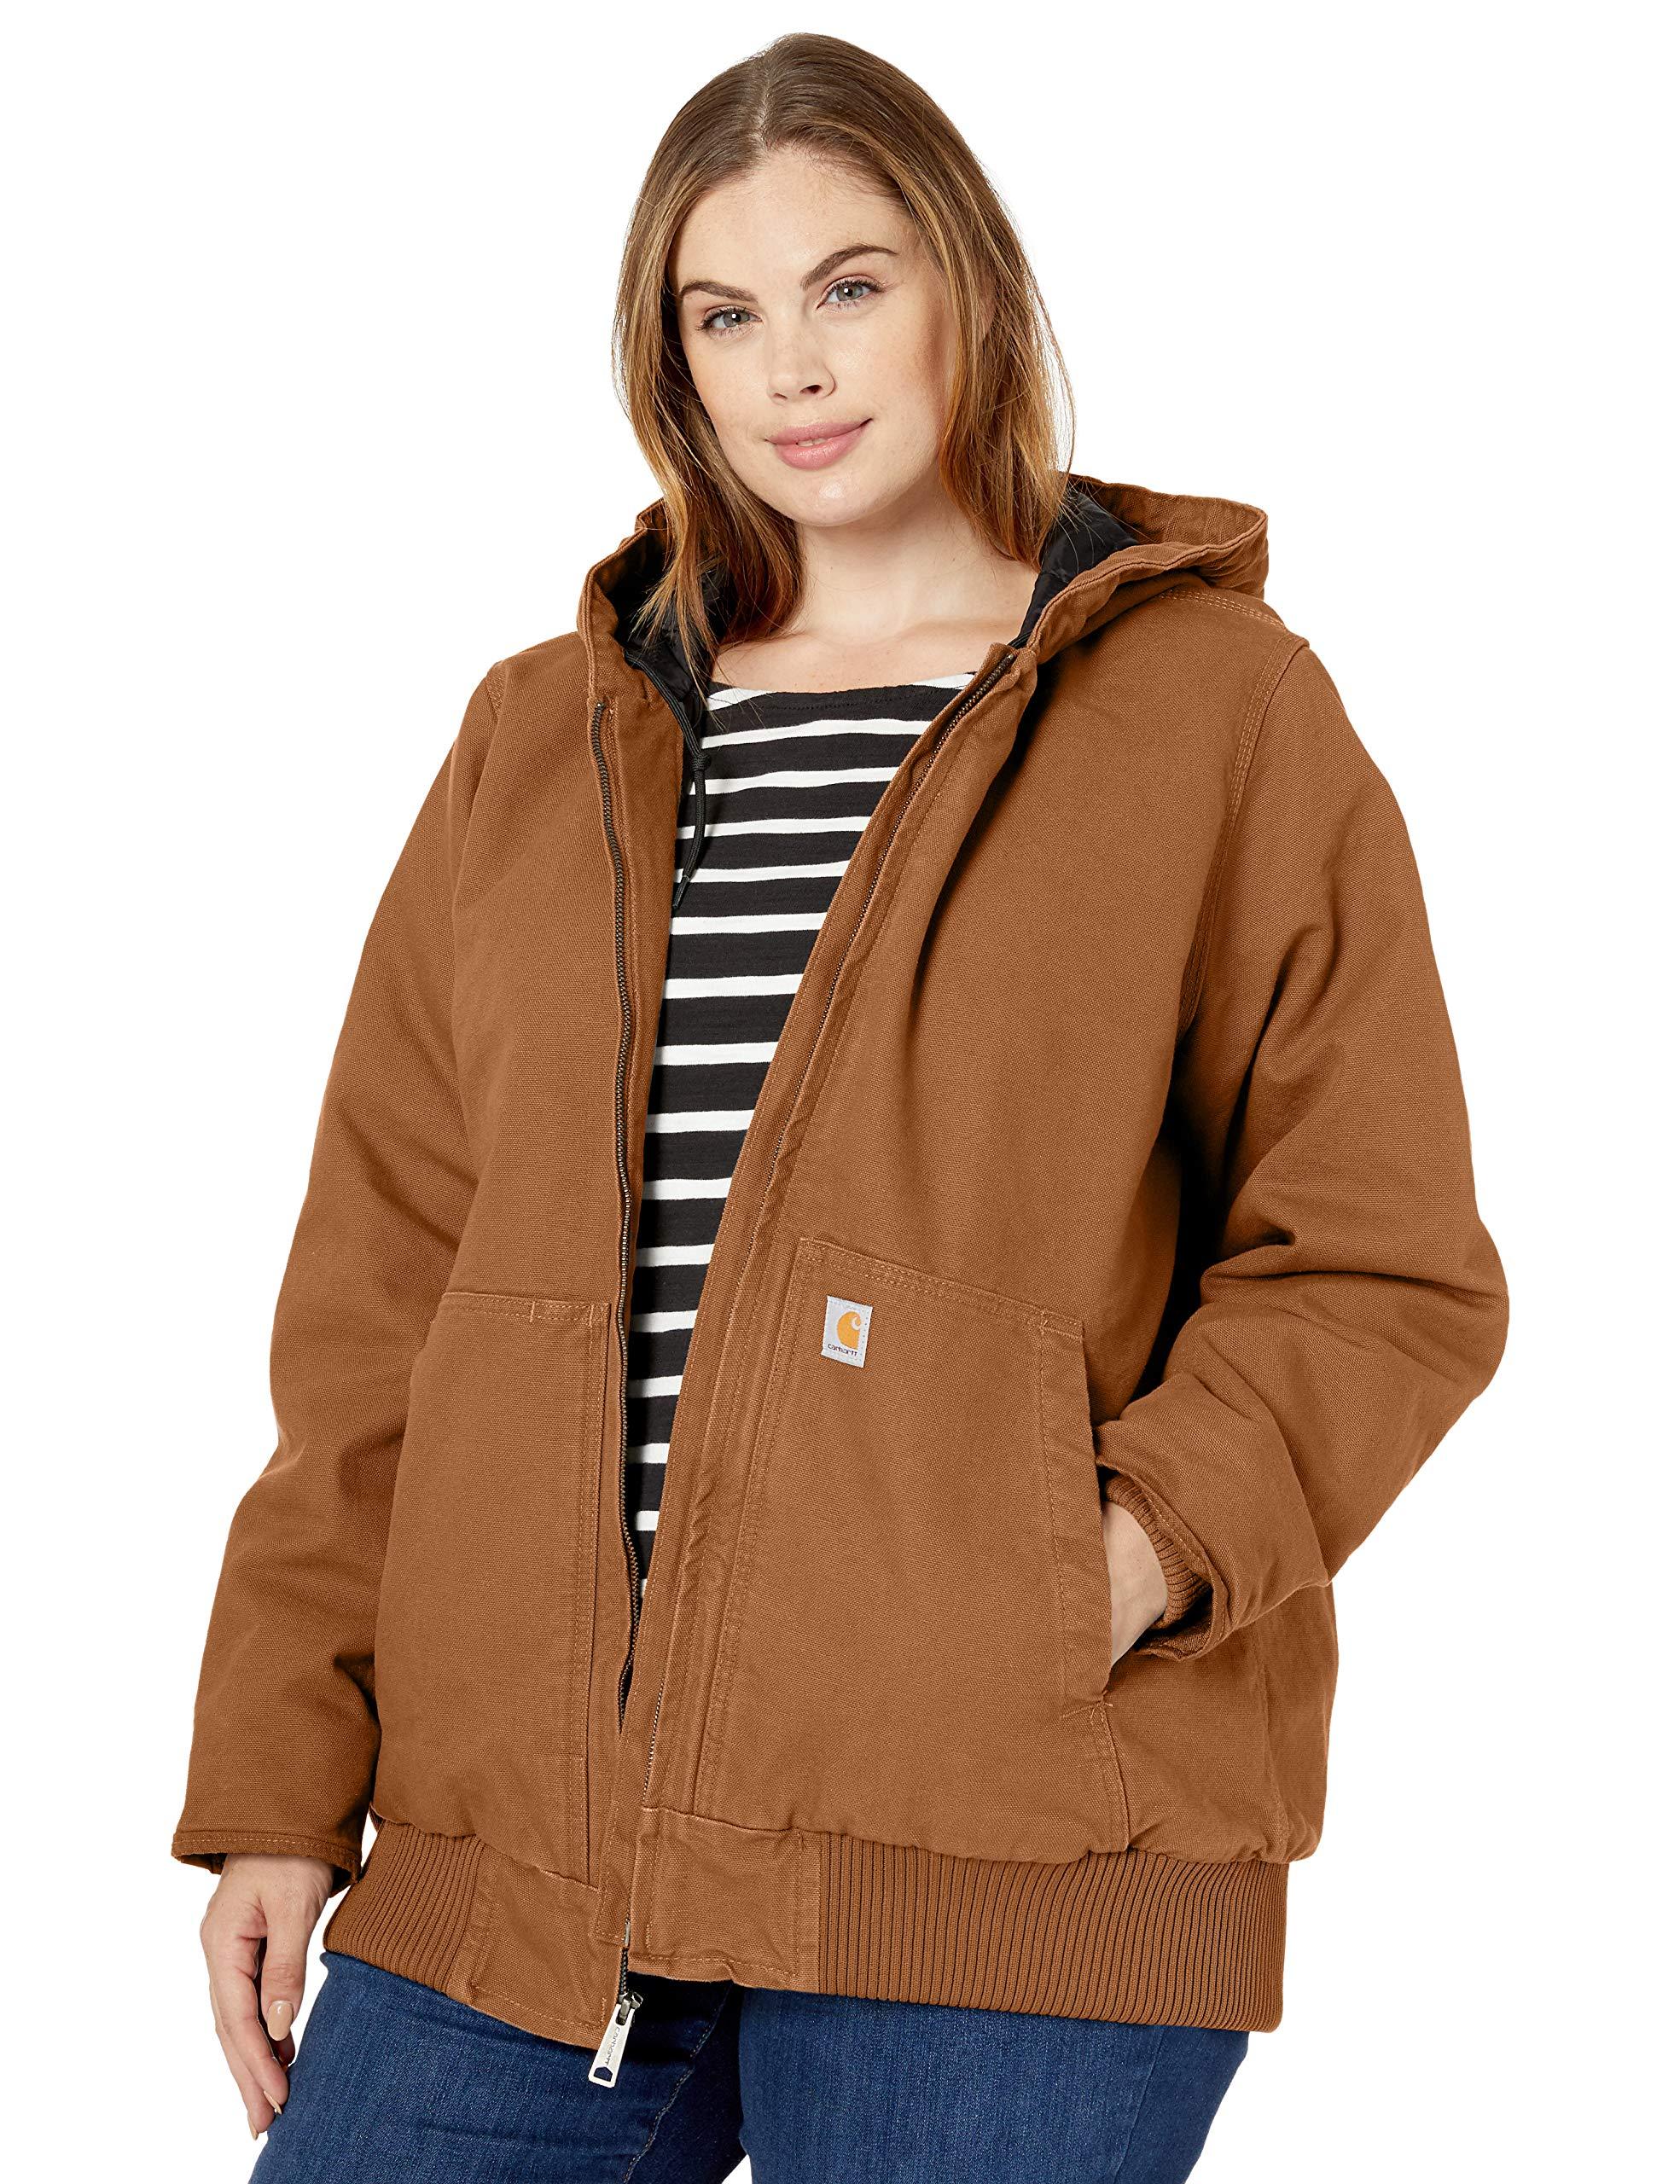 Carhartt Women's Active Jacket Wj130 (Regular and Plus Sizes)